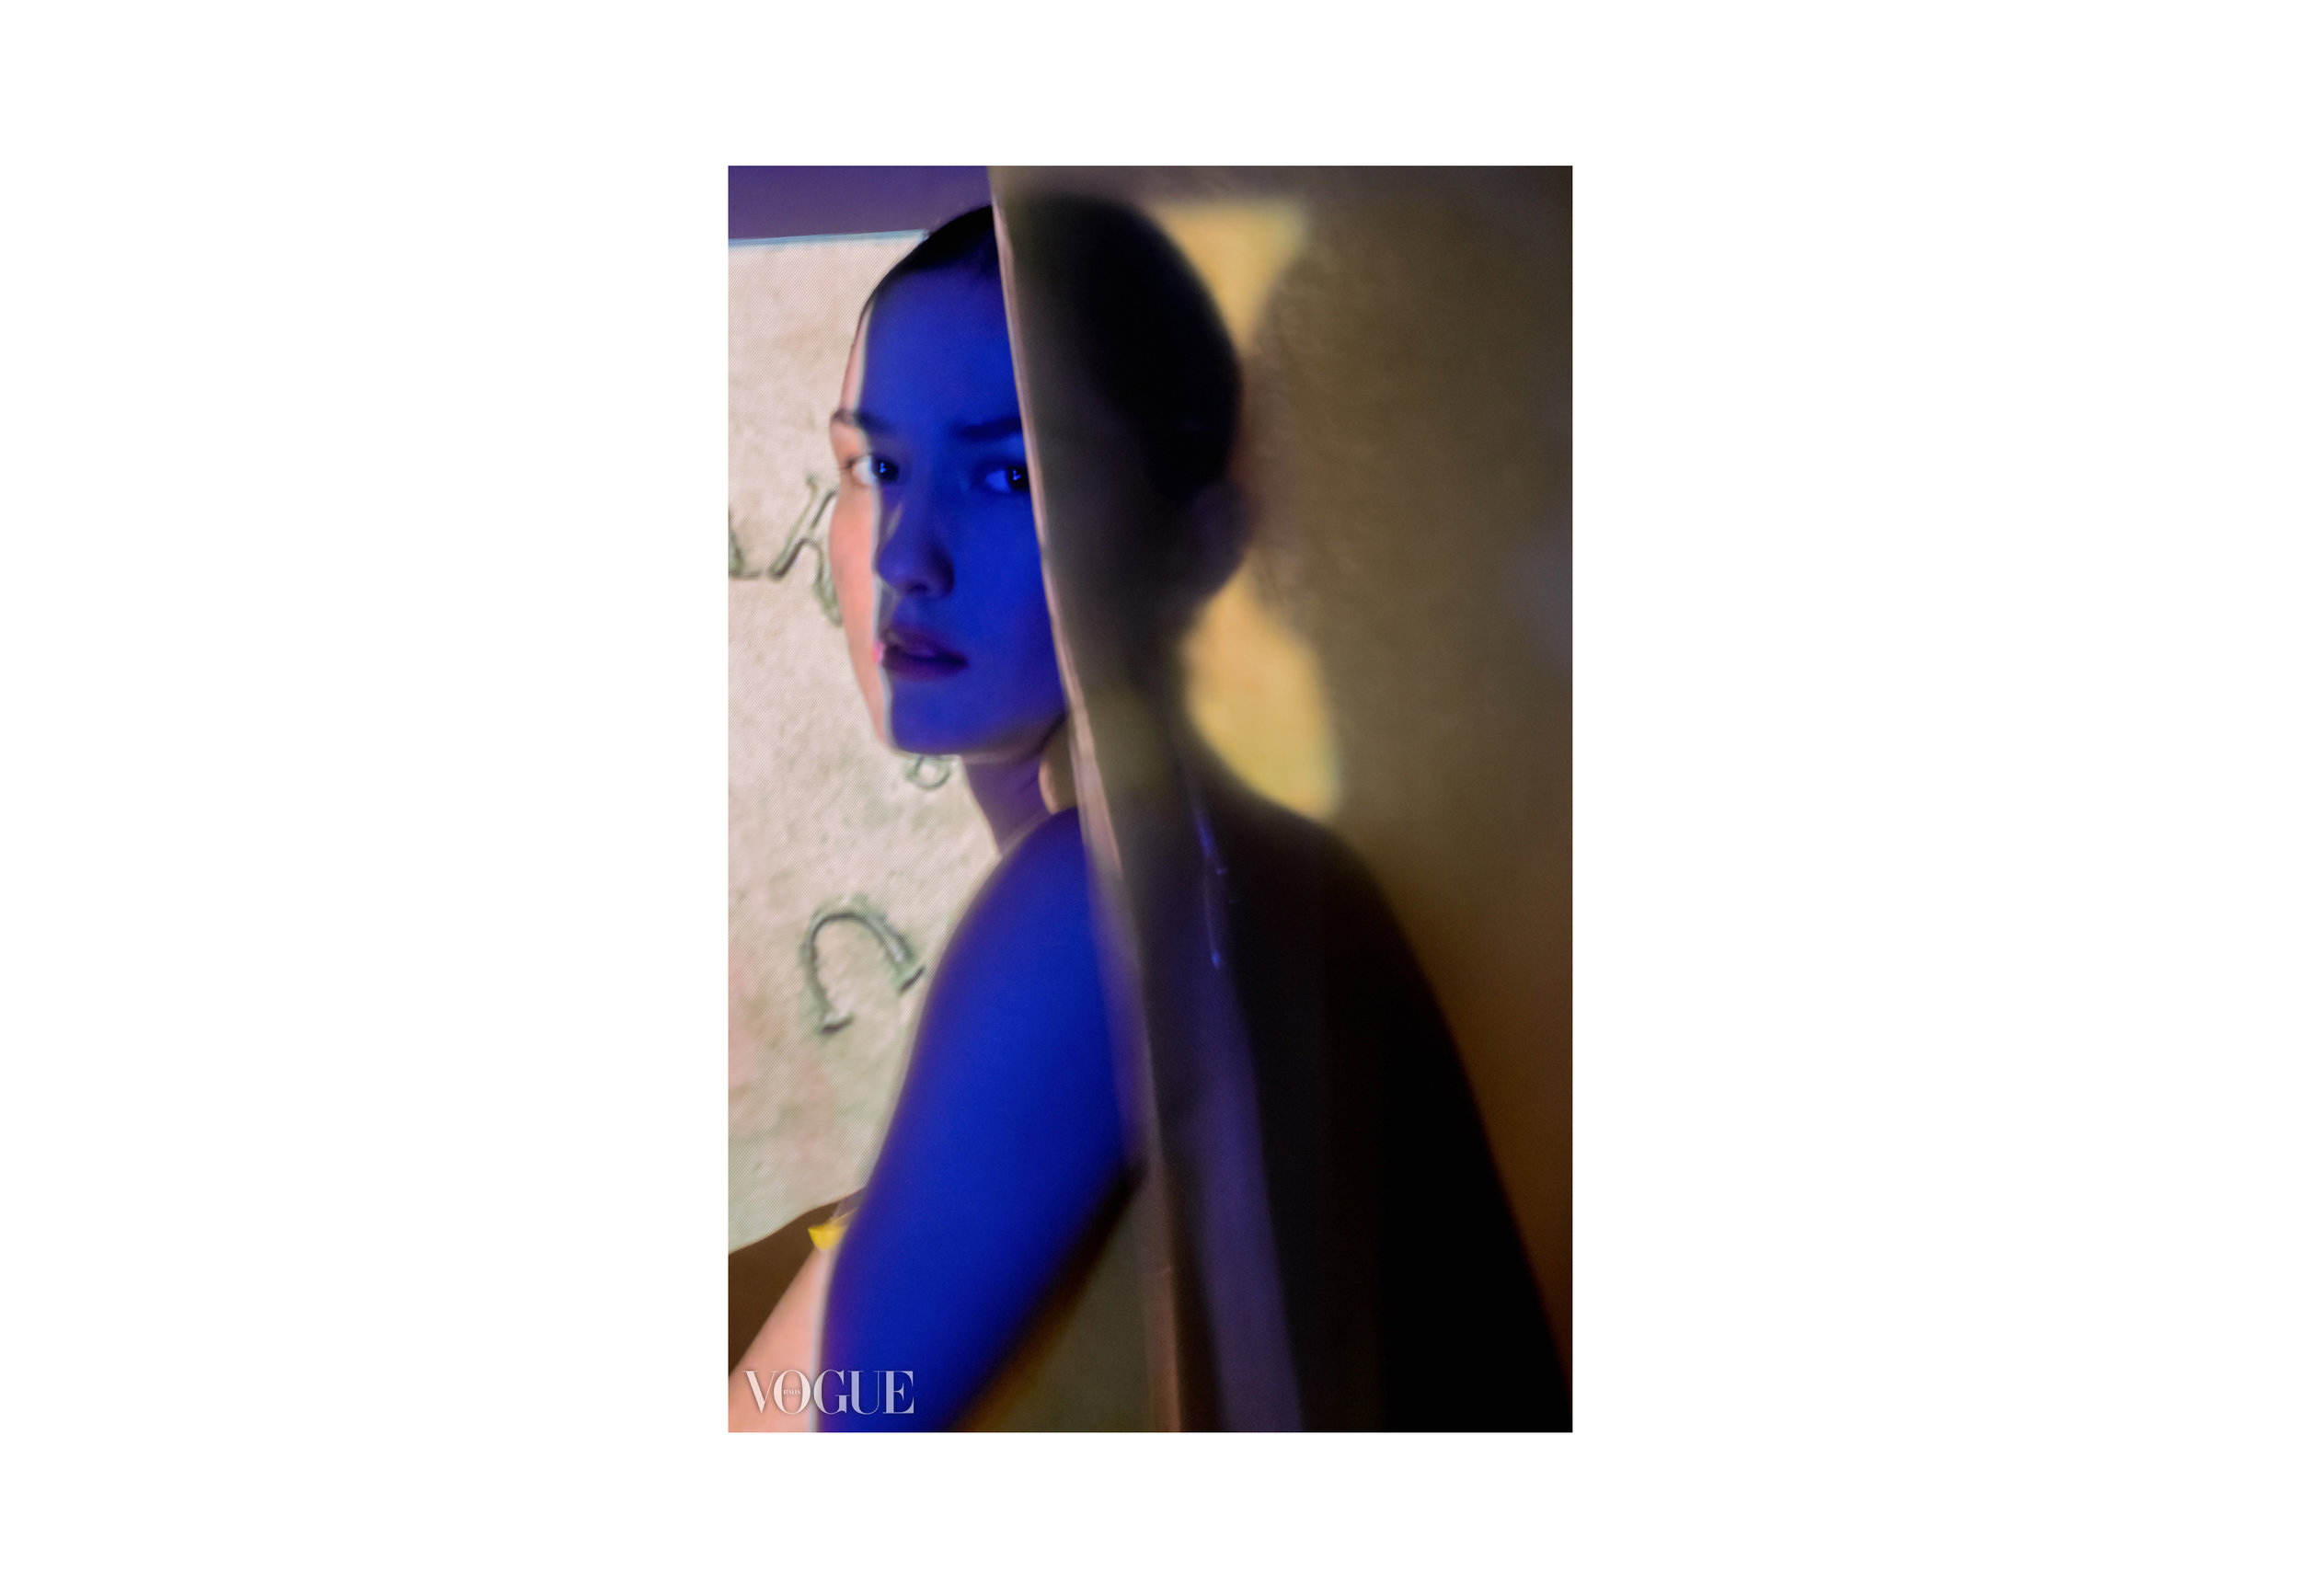 Lorina-H-PhotoVogue-Eveline-Van-De-Griend-Collaboration-Matthew-Coleman-Photography.jpg